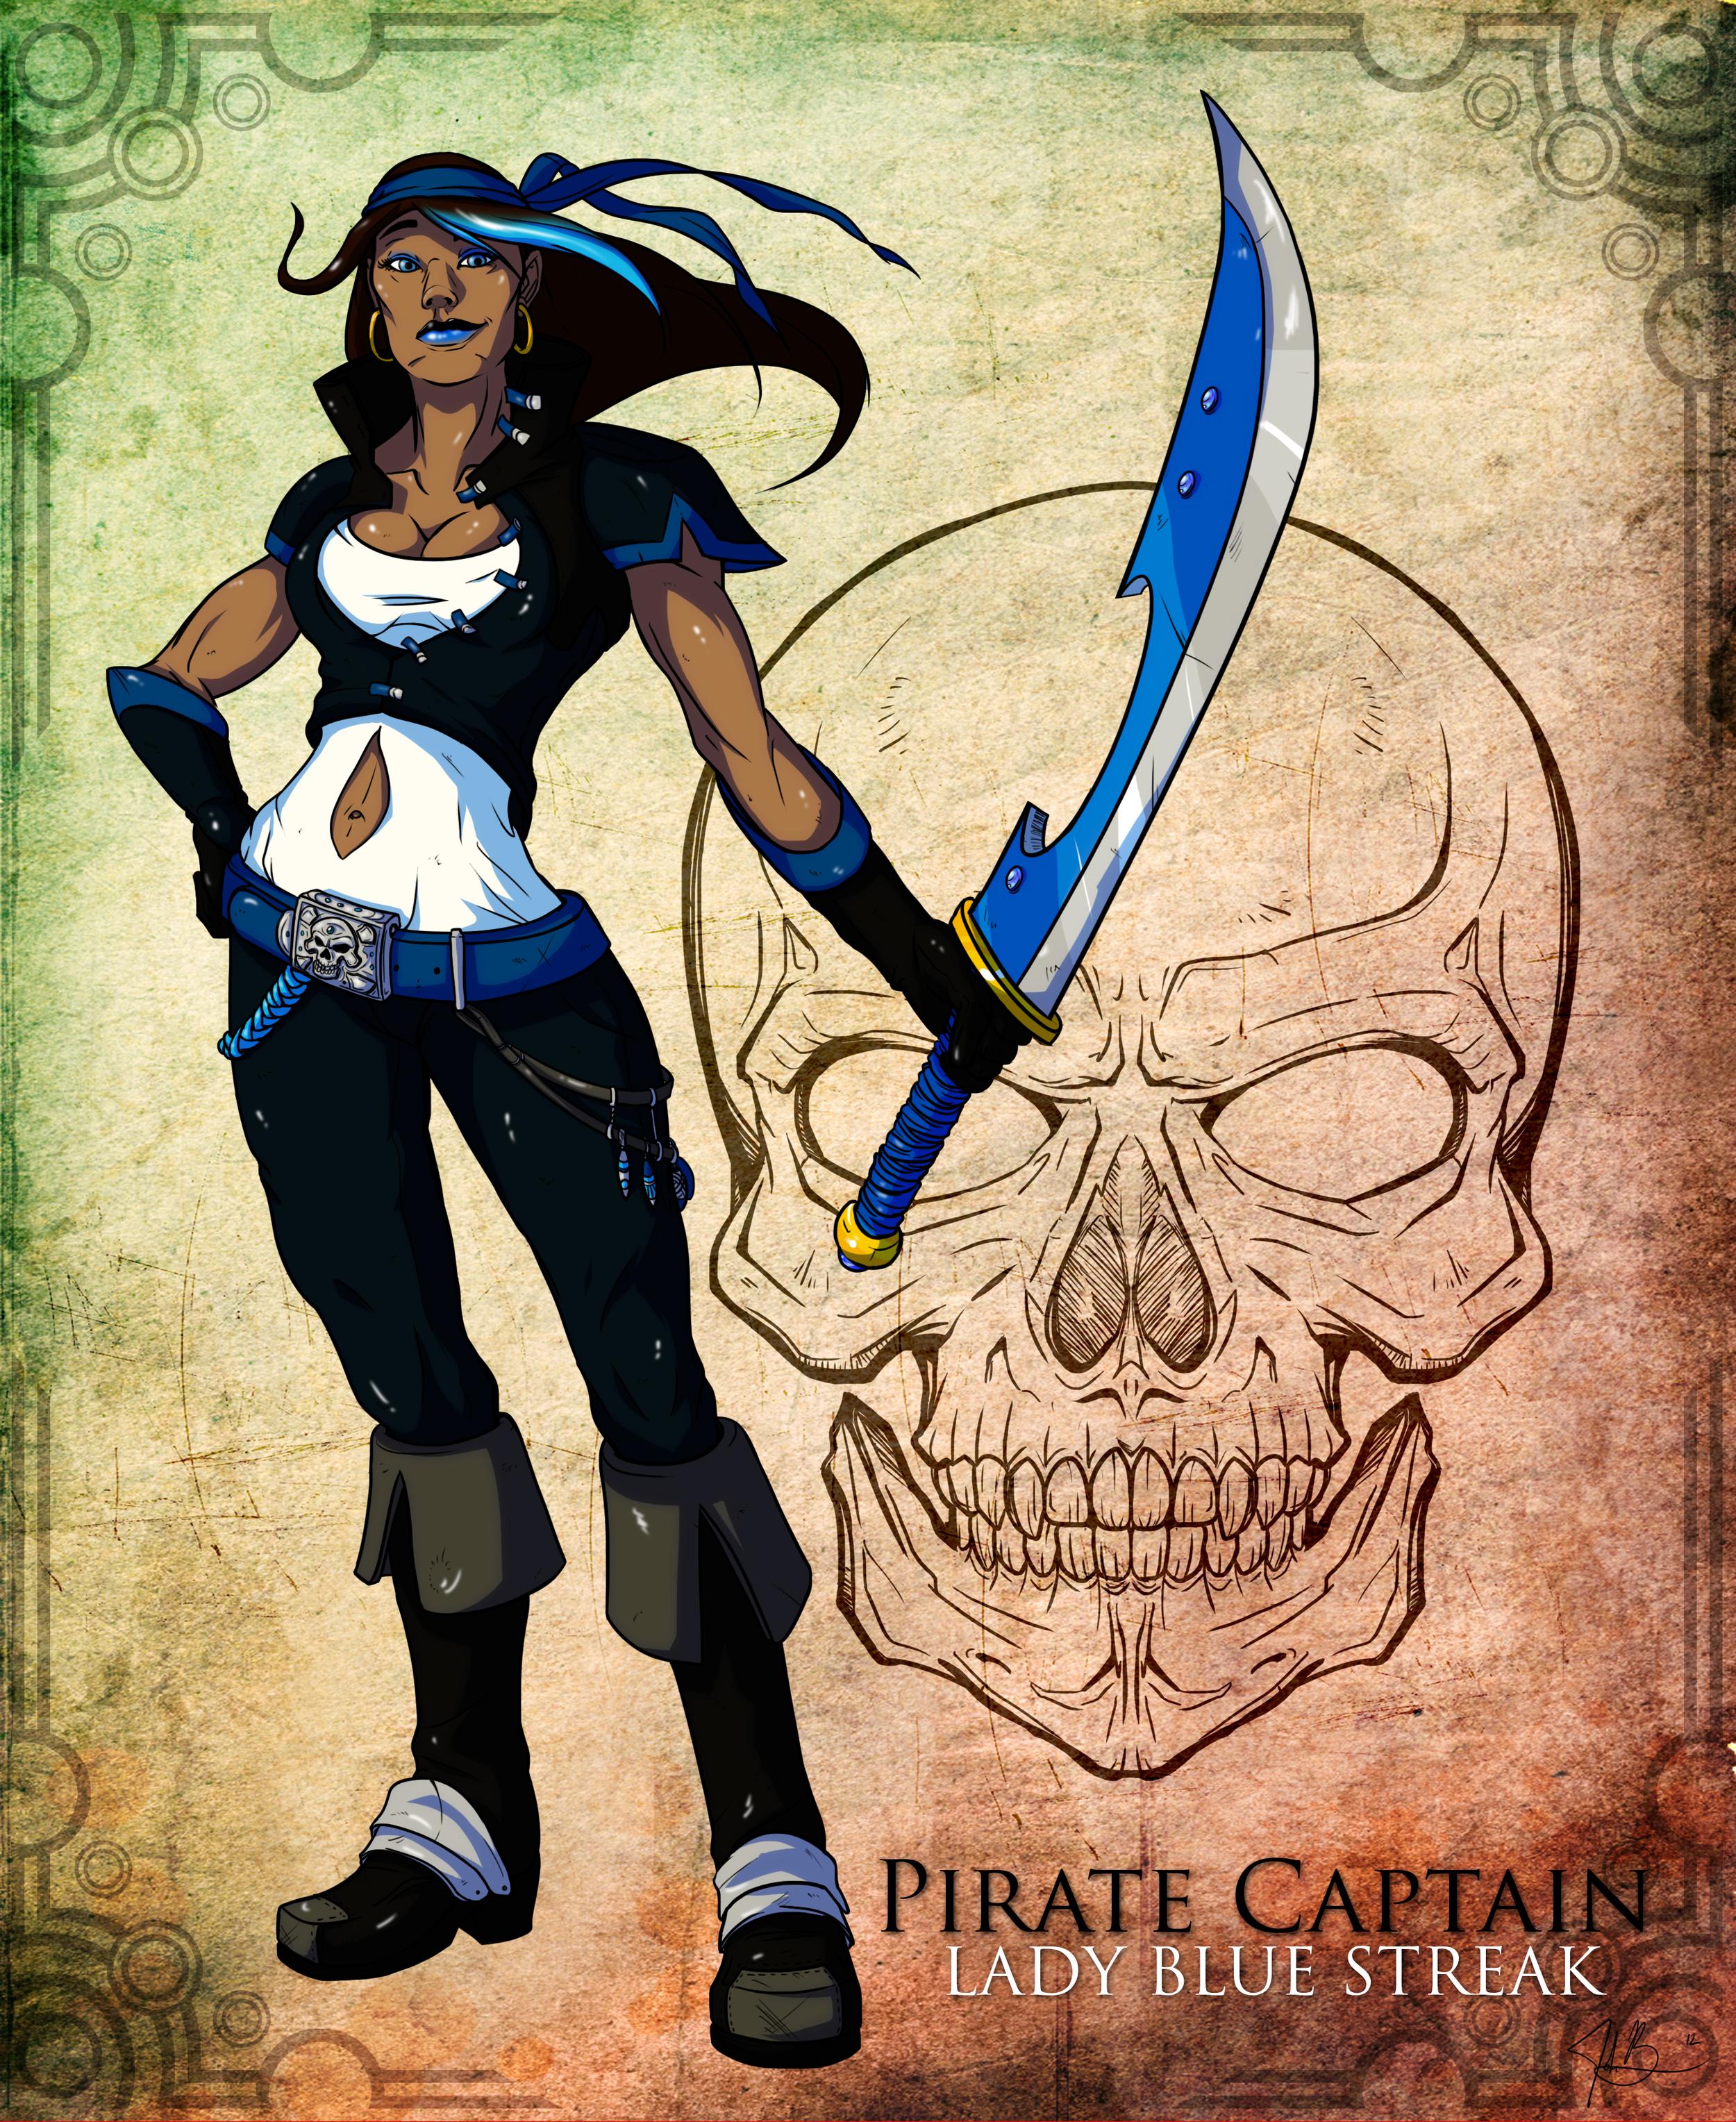 Pirate Captain Lady Blue Streak